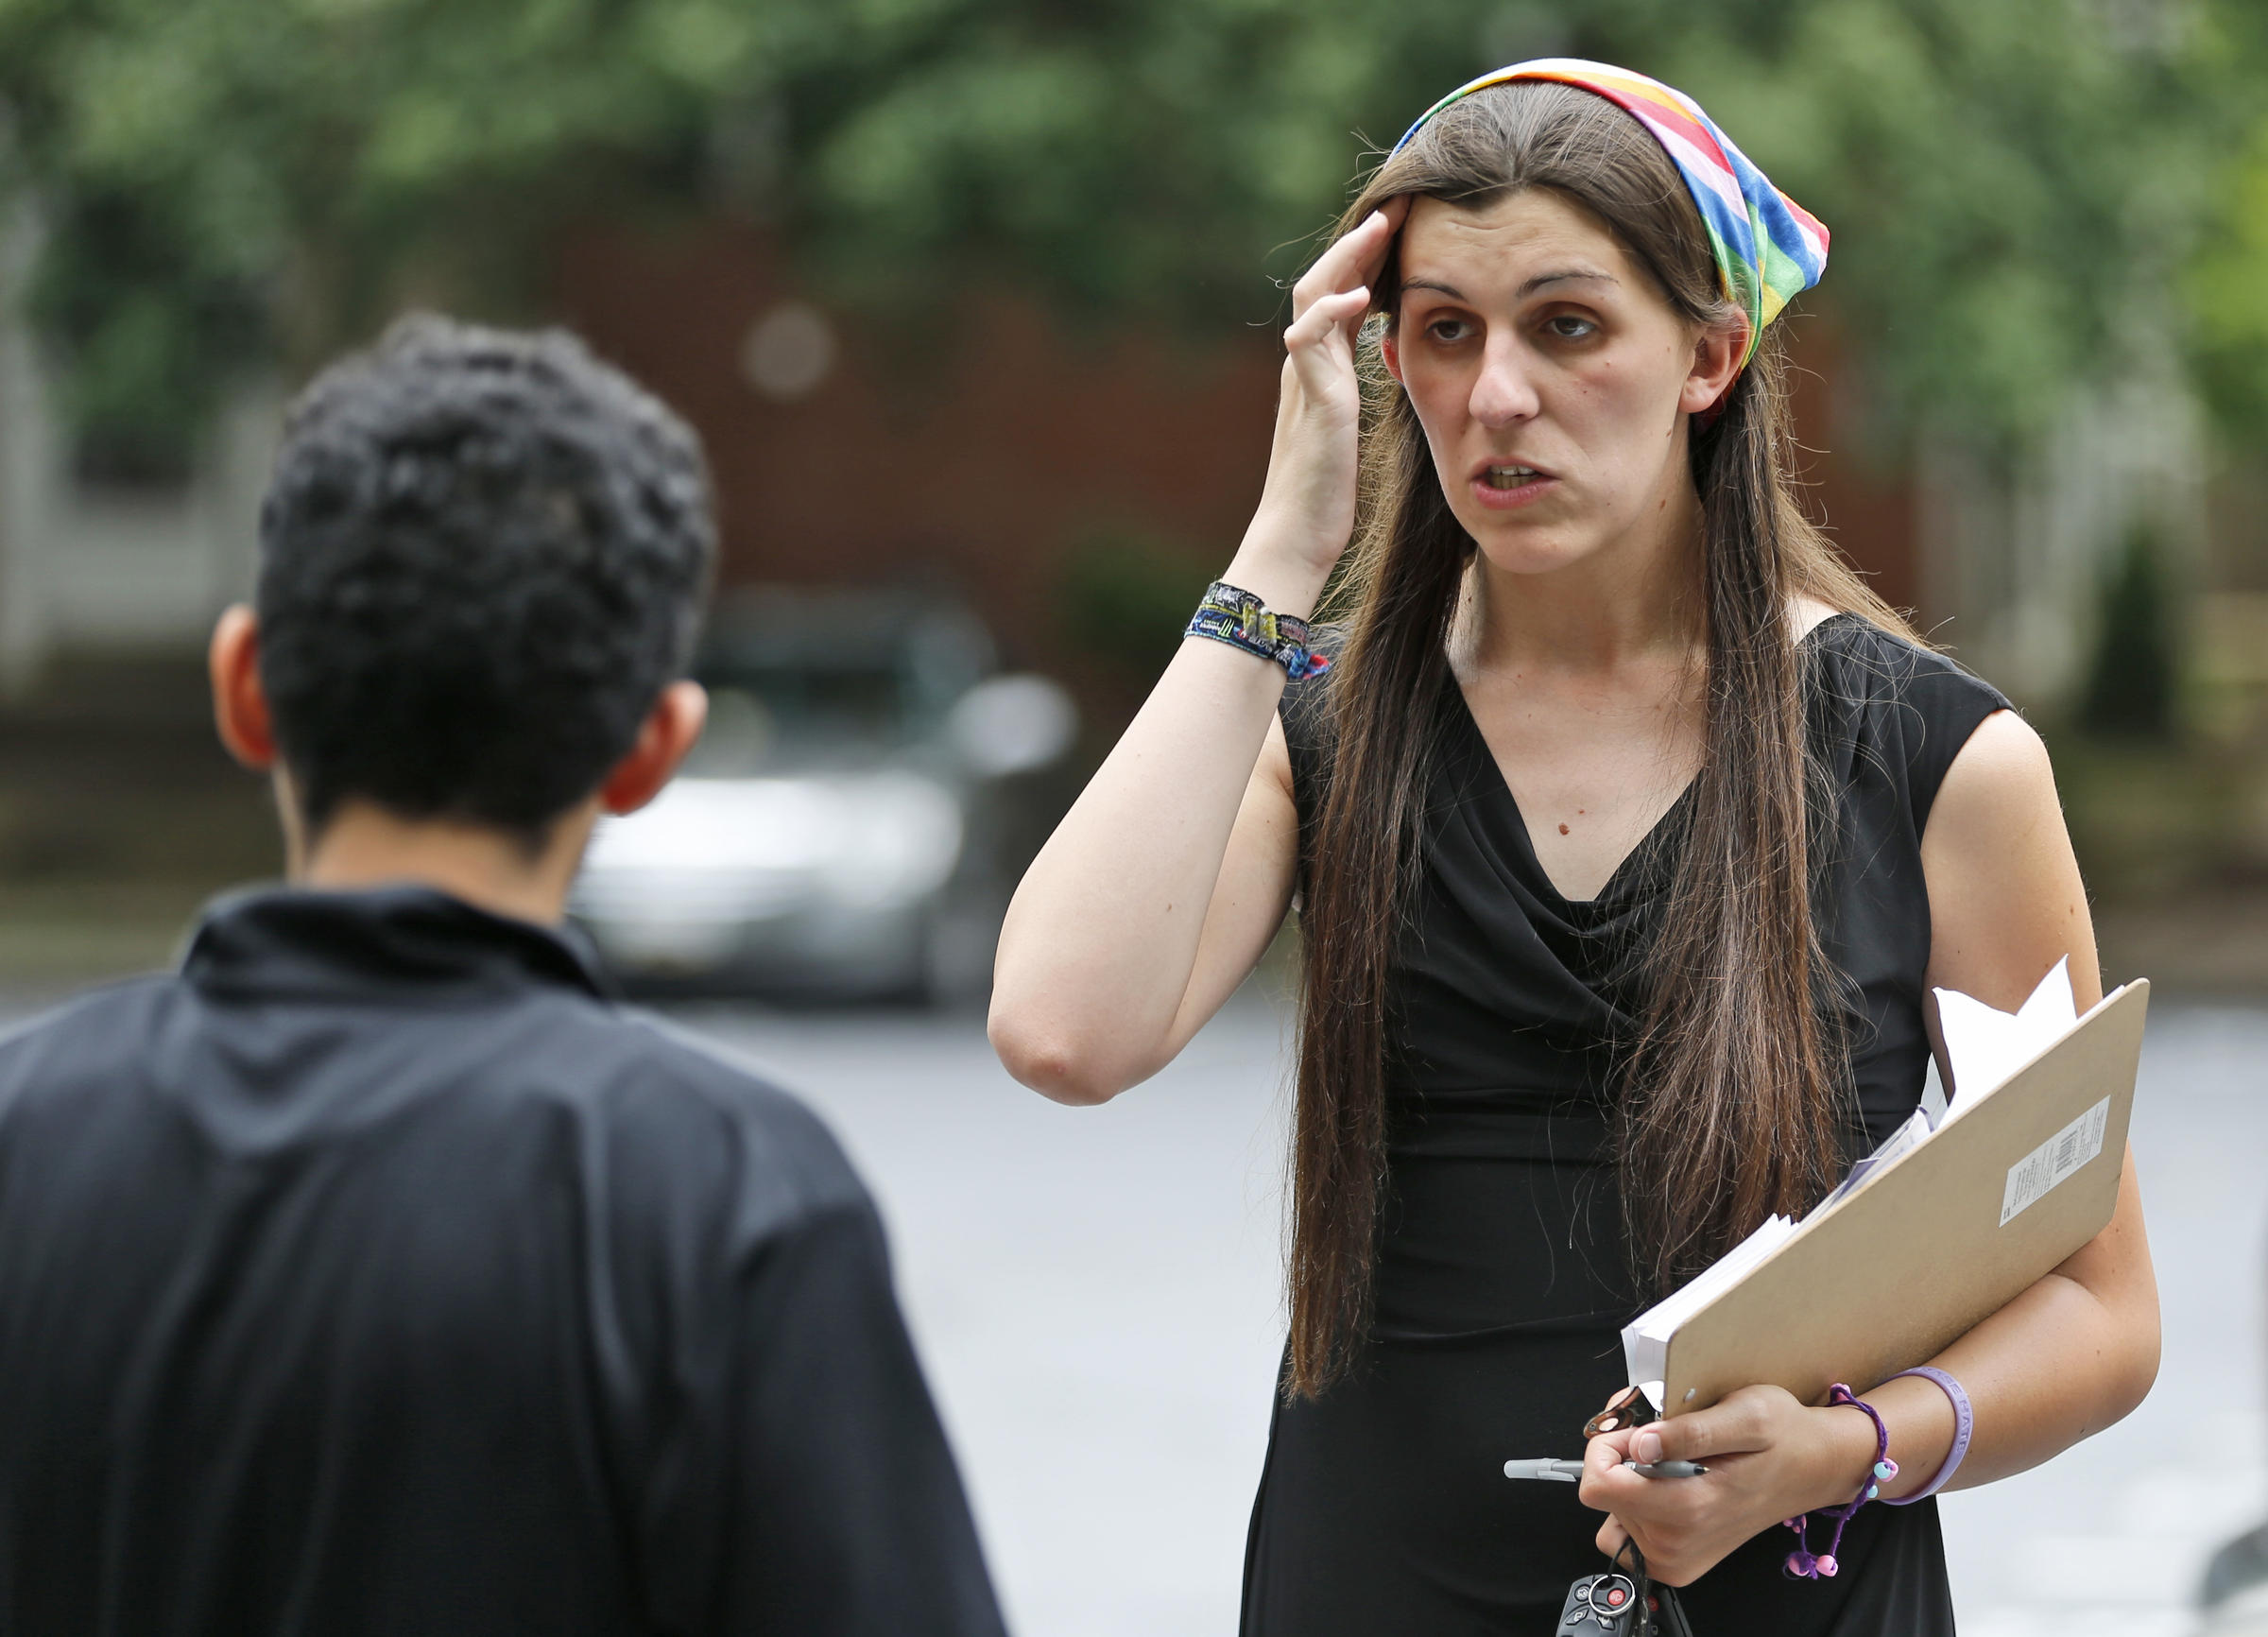 transgendered in northern virginia